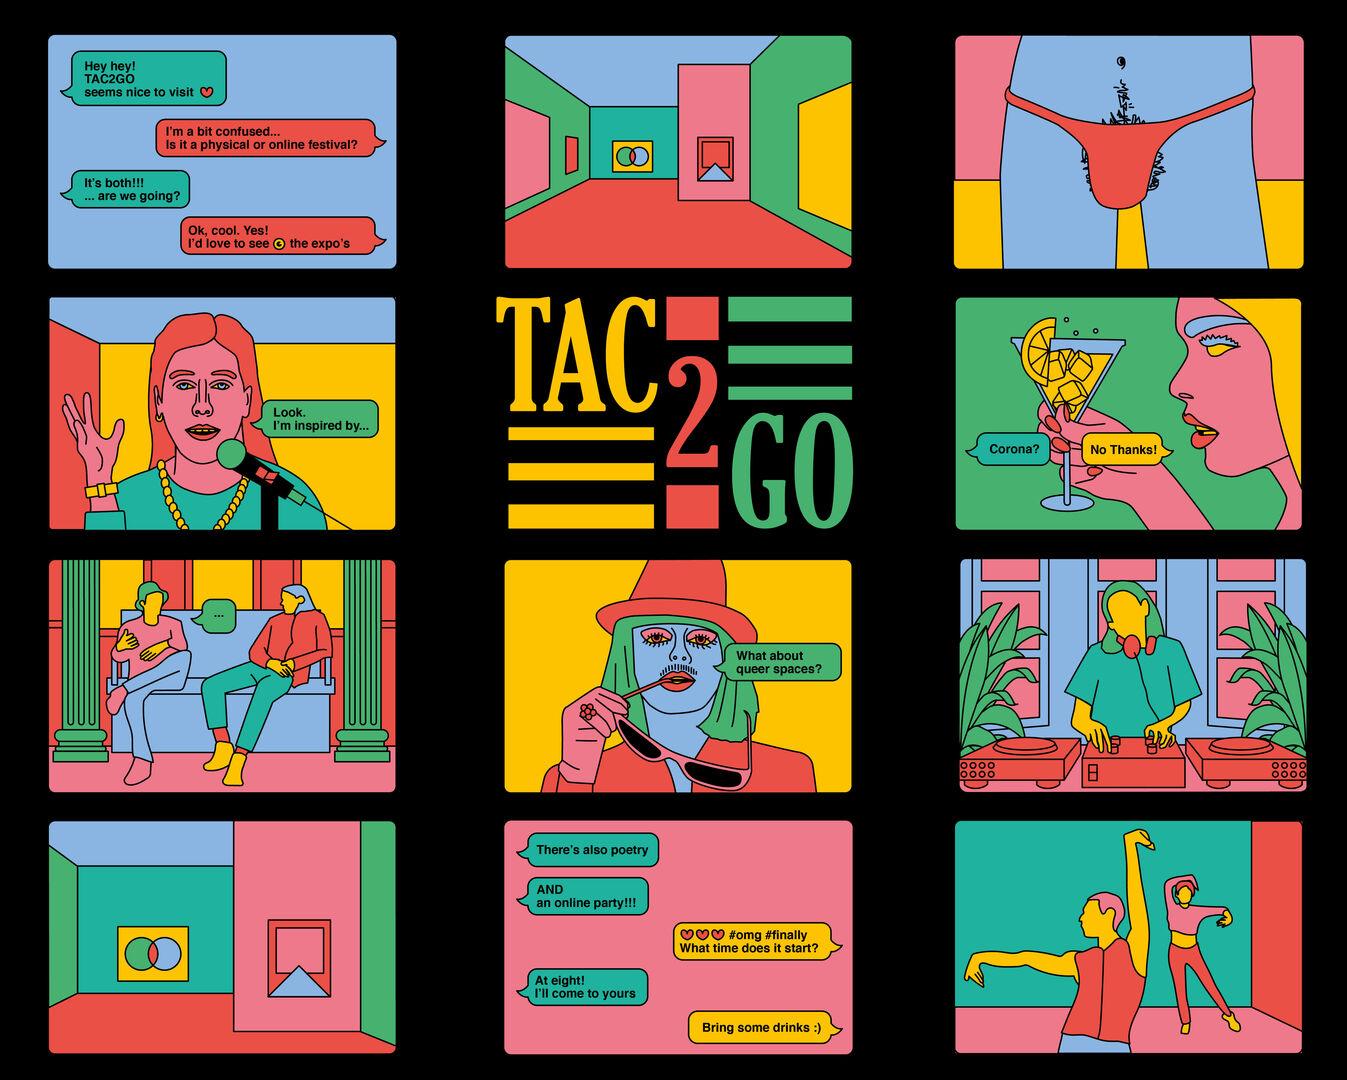 TAC 2 GO - hybride kunstfestival